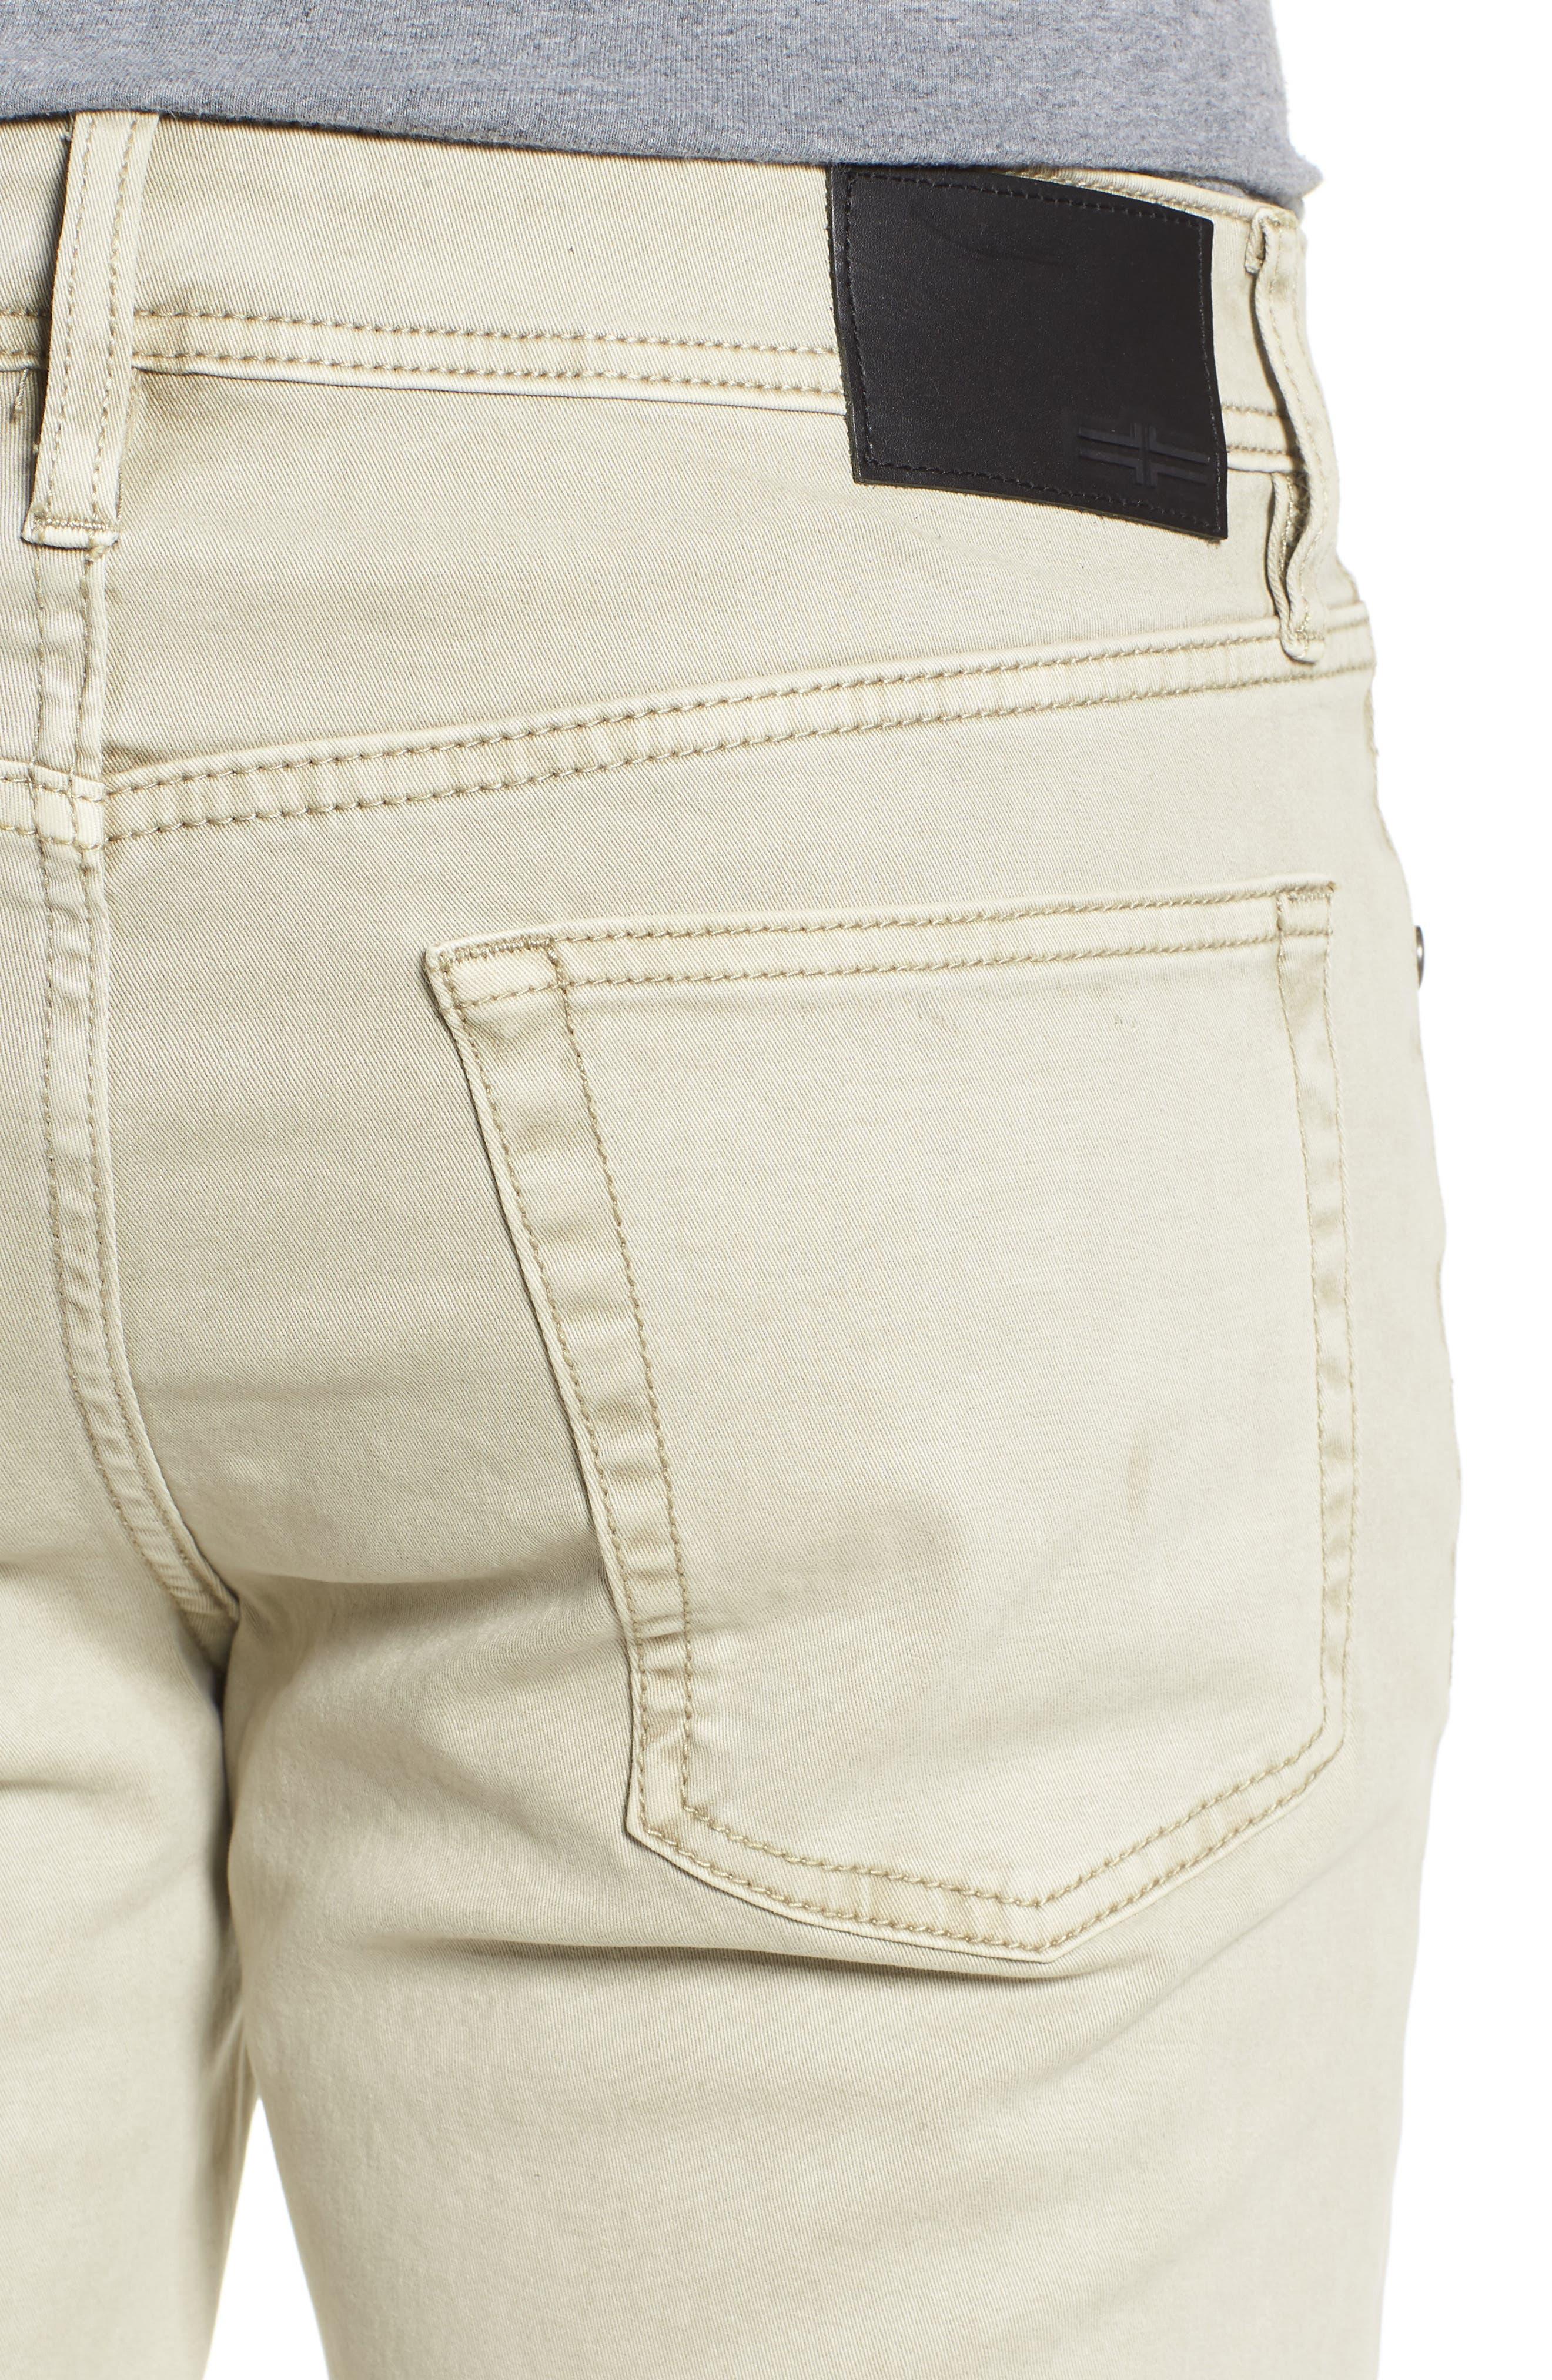 Jeans Co. Straight Leg Jeans,                             Alternate thumbnail 4, color,                             SANDSTROM